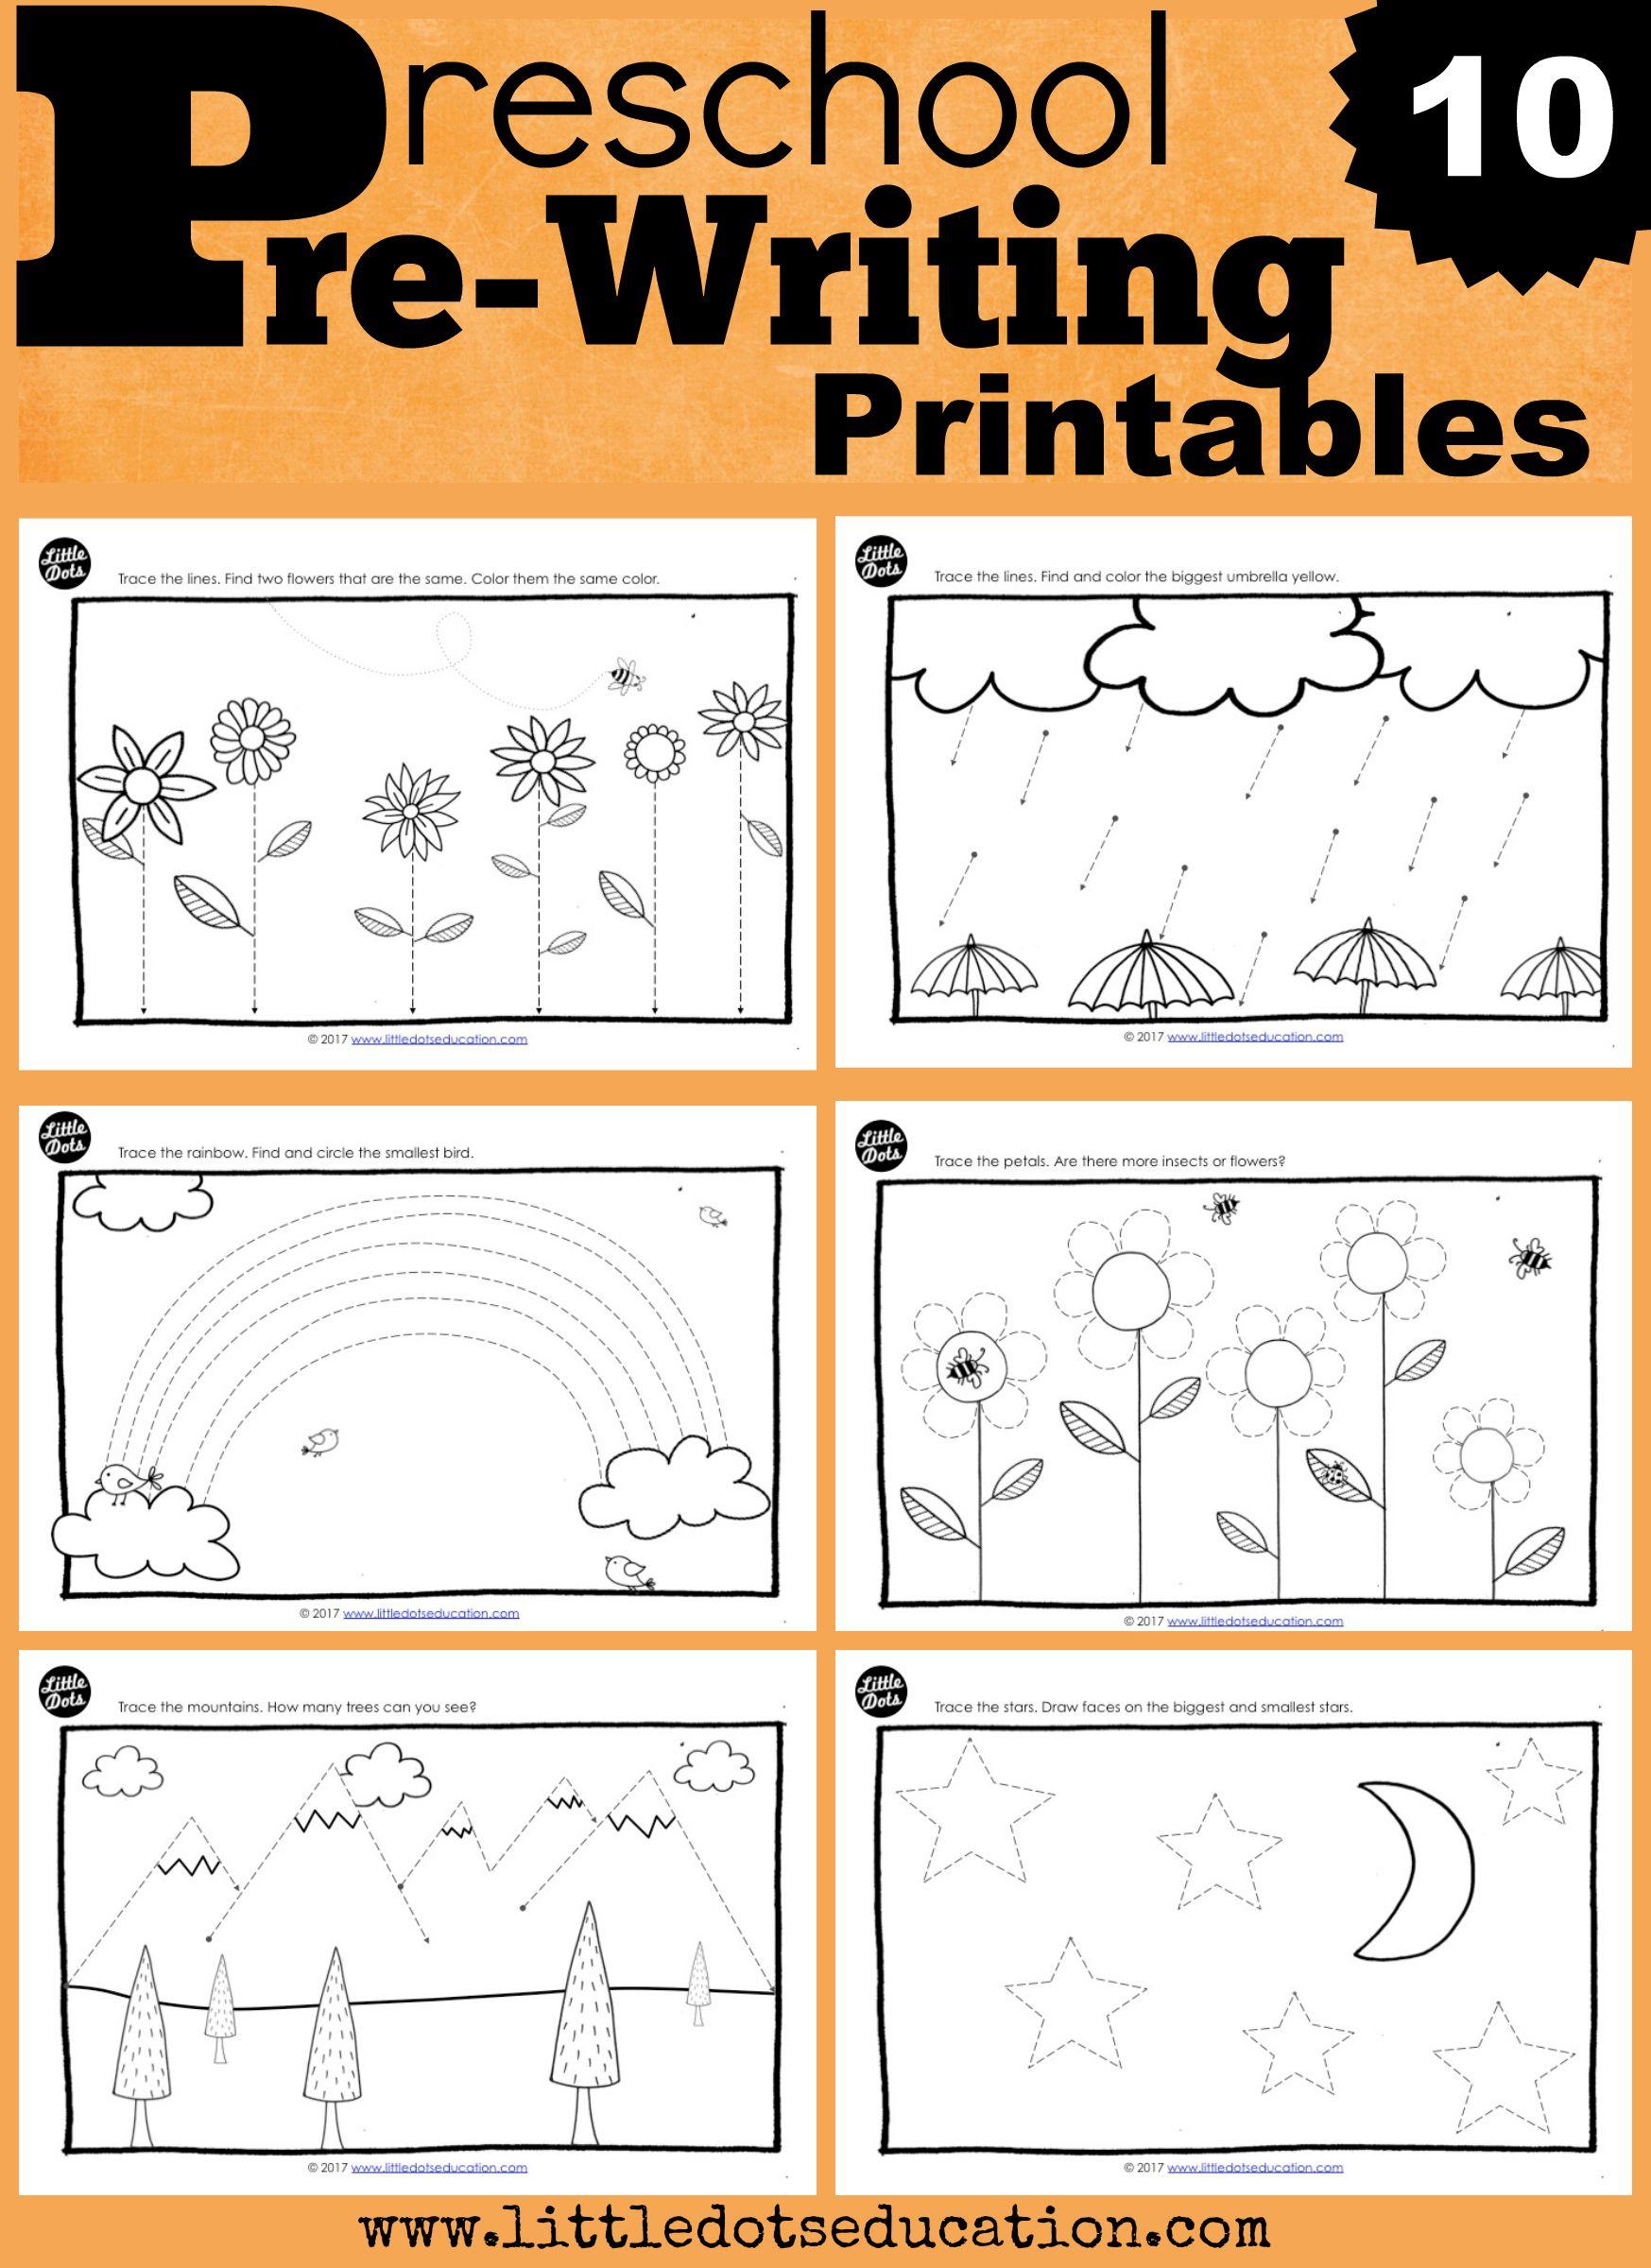 Pre Writing Printables For Preschool Pre Writing Activities Writing Activities For Preschoolers Writing Activities [ 2400 x 1747 Pixel ]